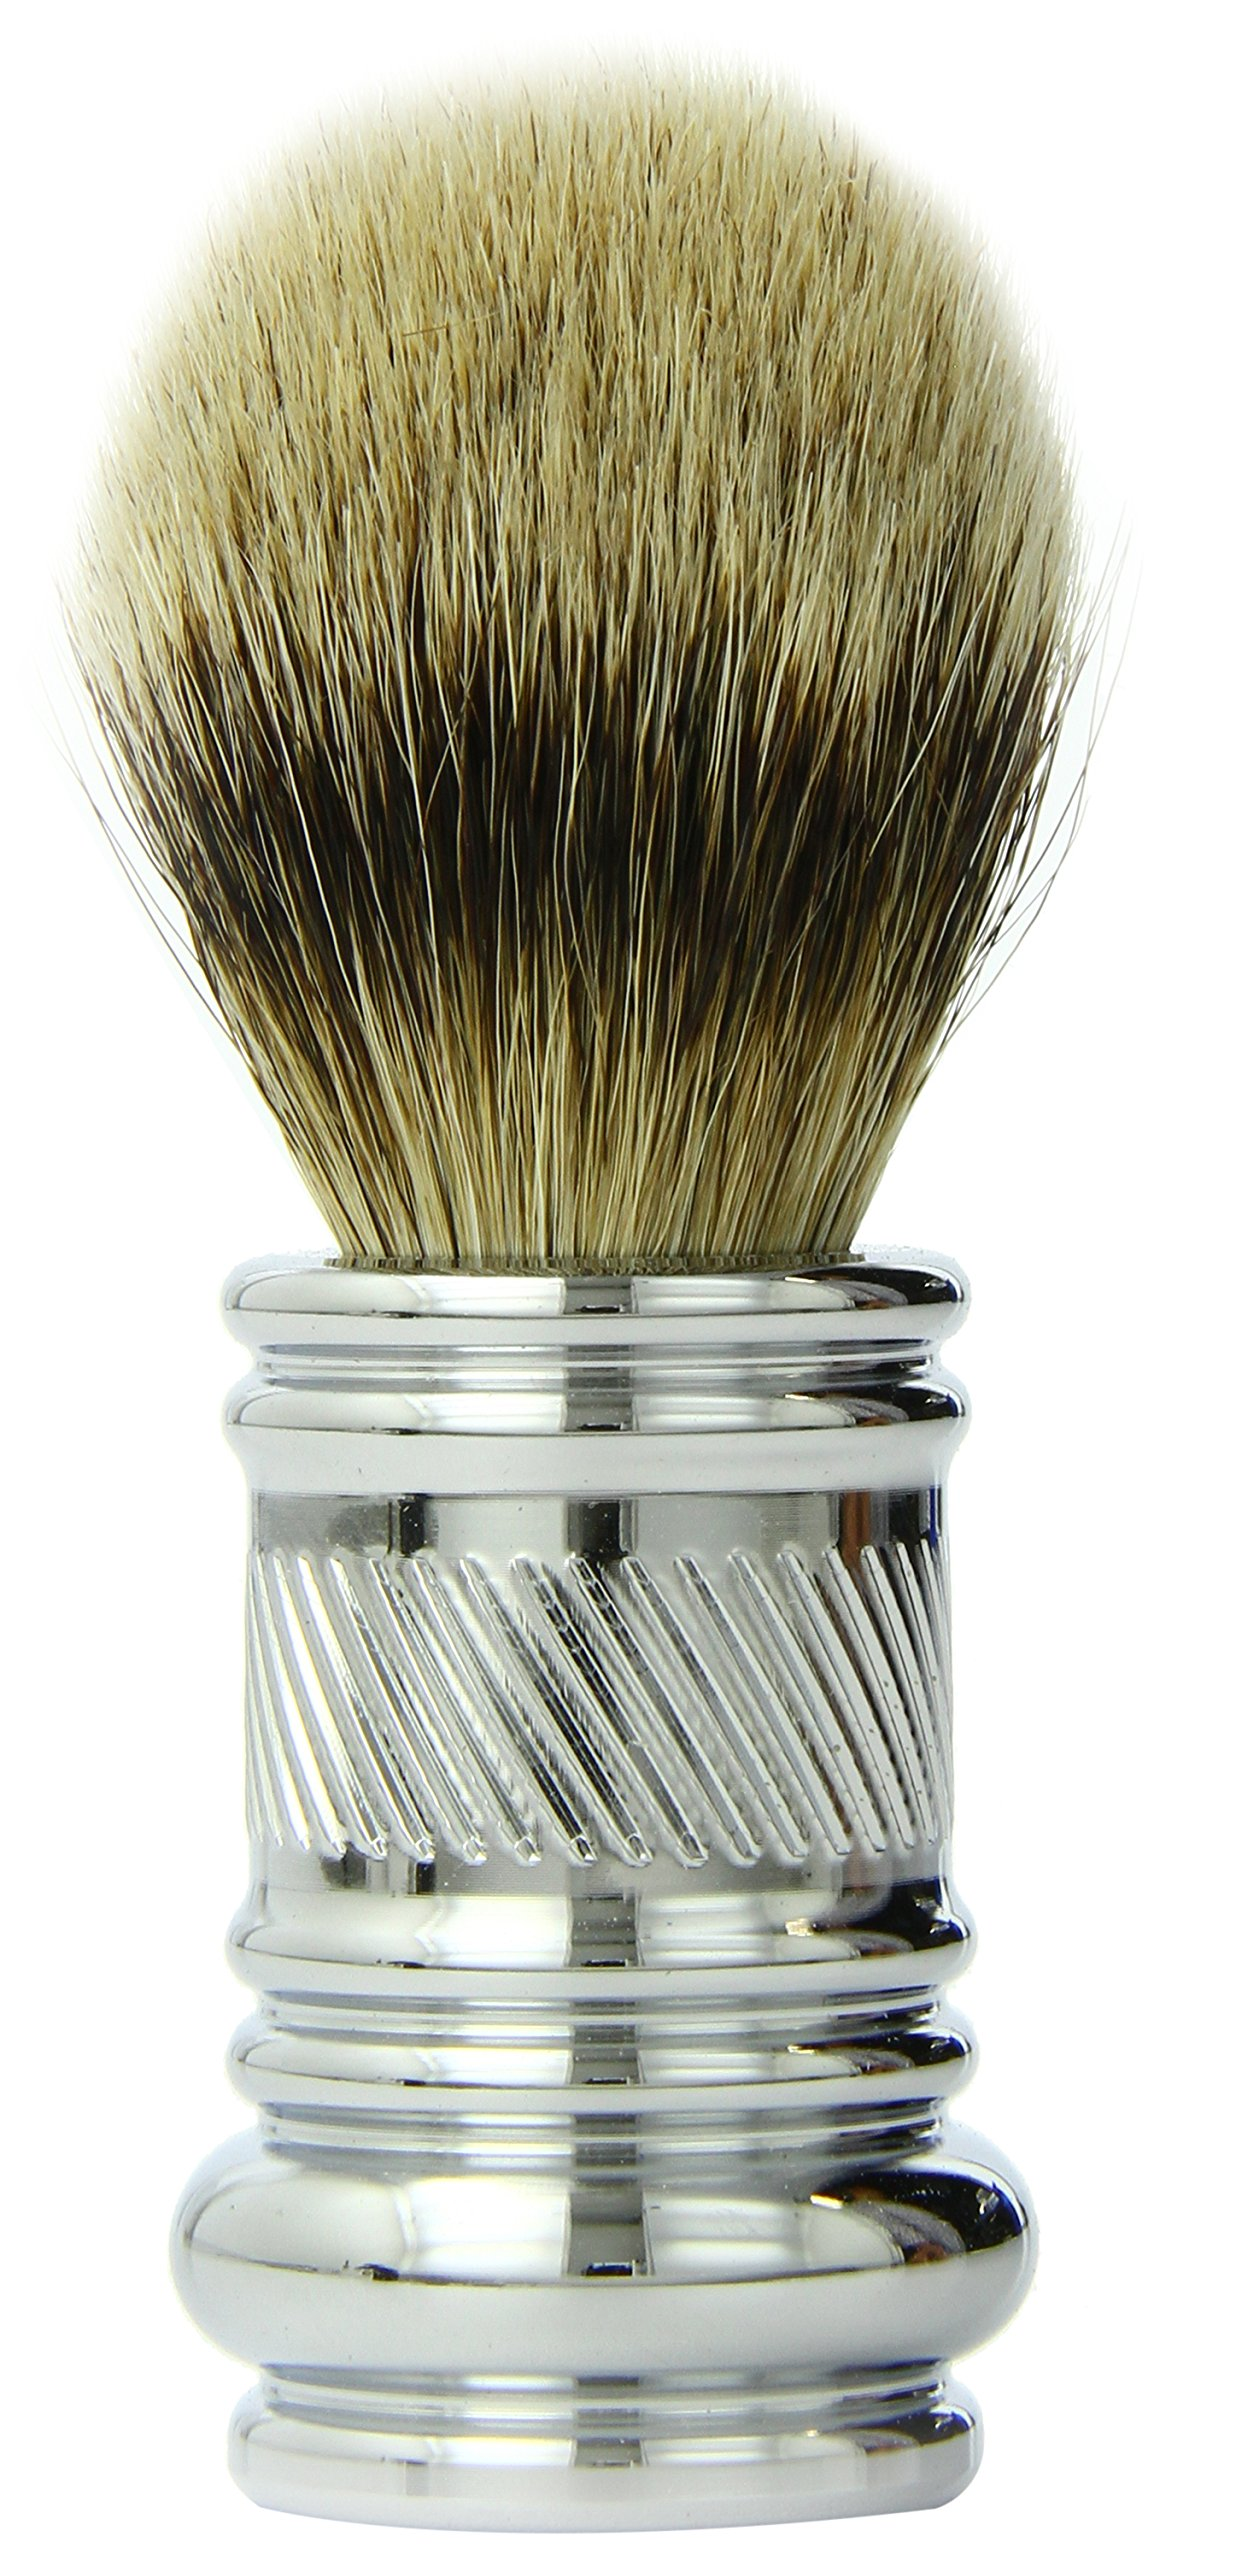 Merkur-Razor Shaving Brush Chrome